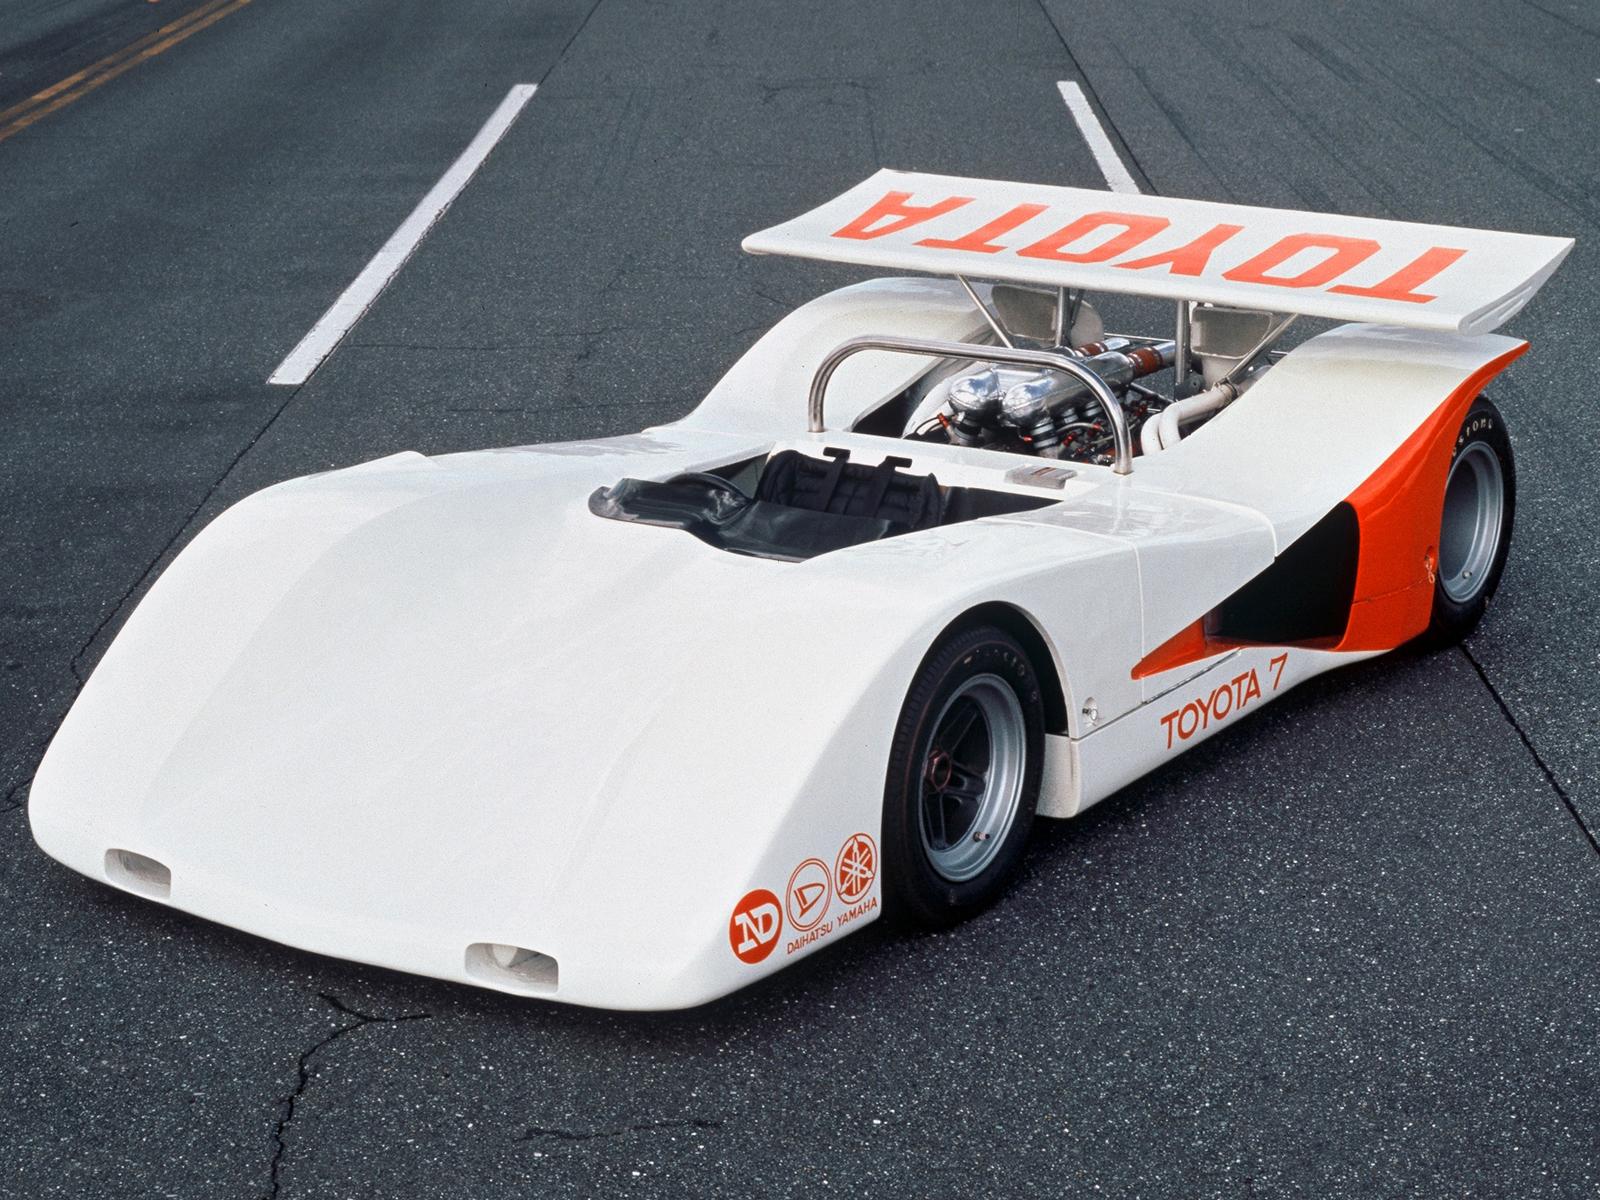 1967 Toyota 7 grand prix g-p race racing engine h wallpaper   1600x1200   147404   WallpaperUP